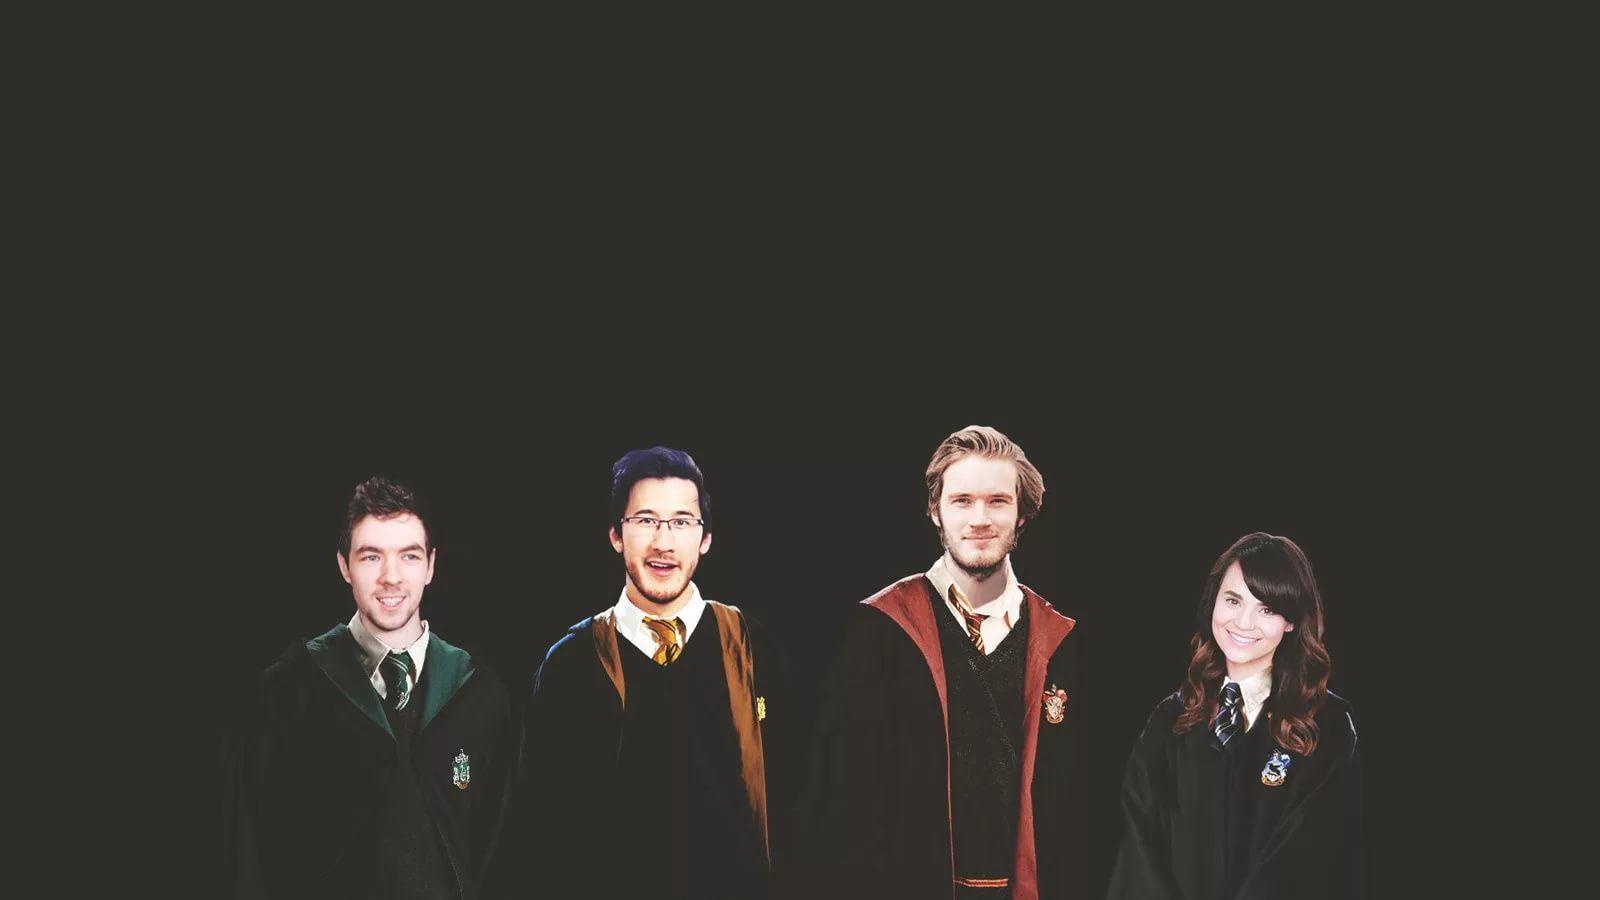 Harry Potter wallpaper download